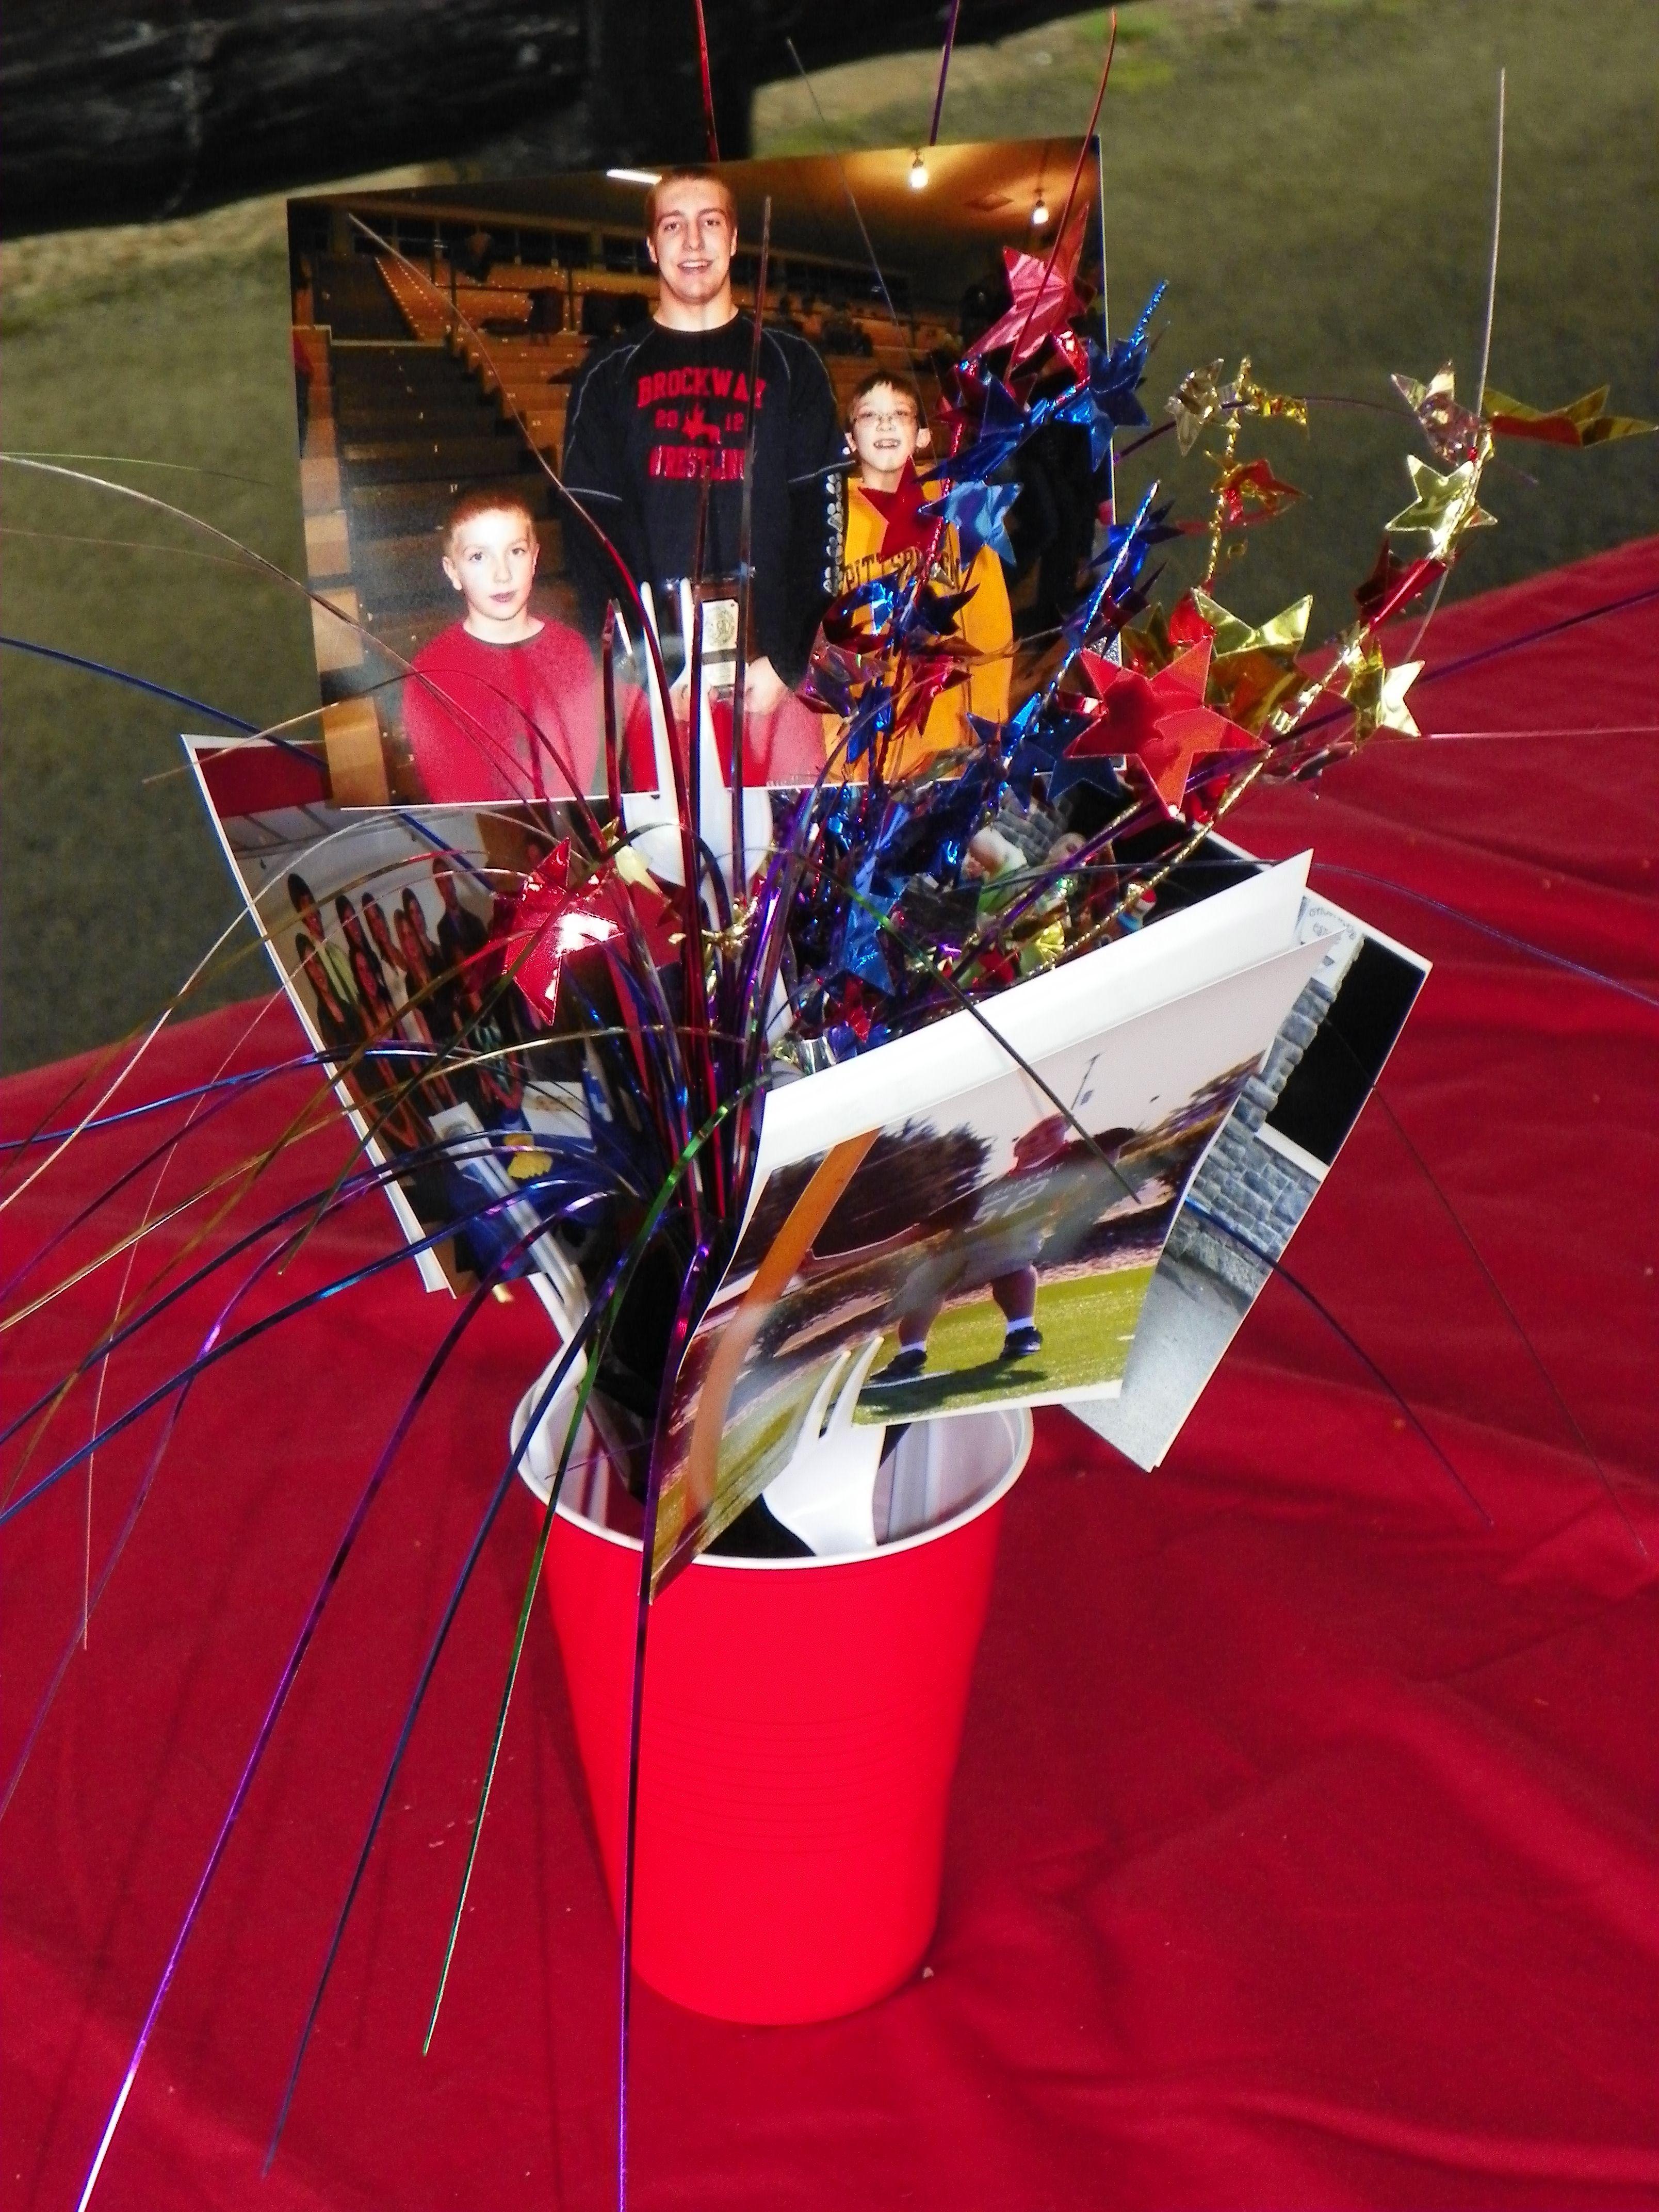 Graduation centerpiece using photos balloon weights red